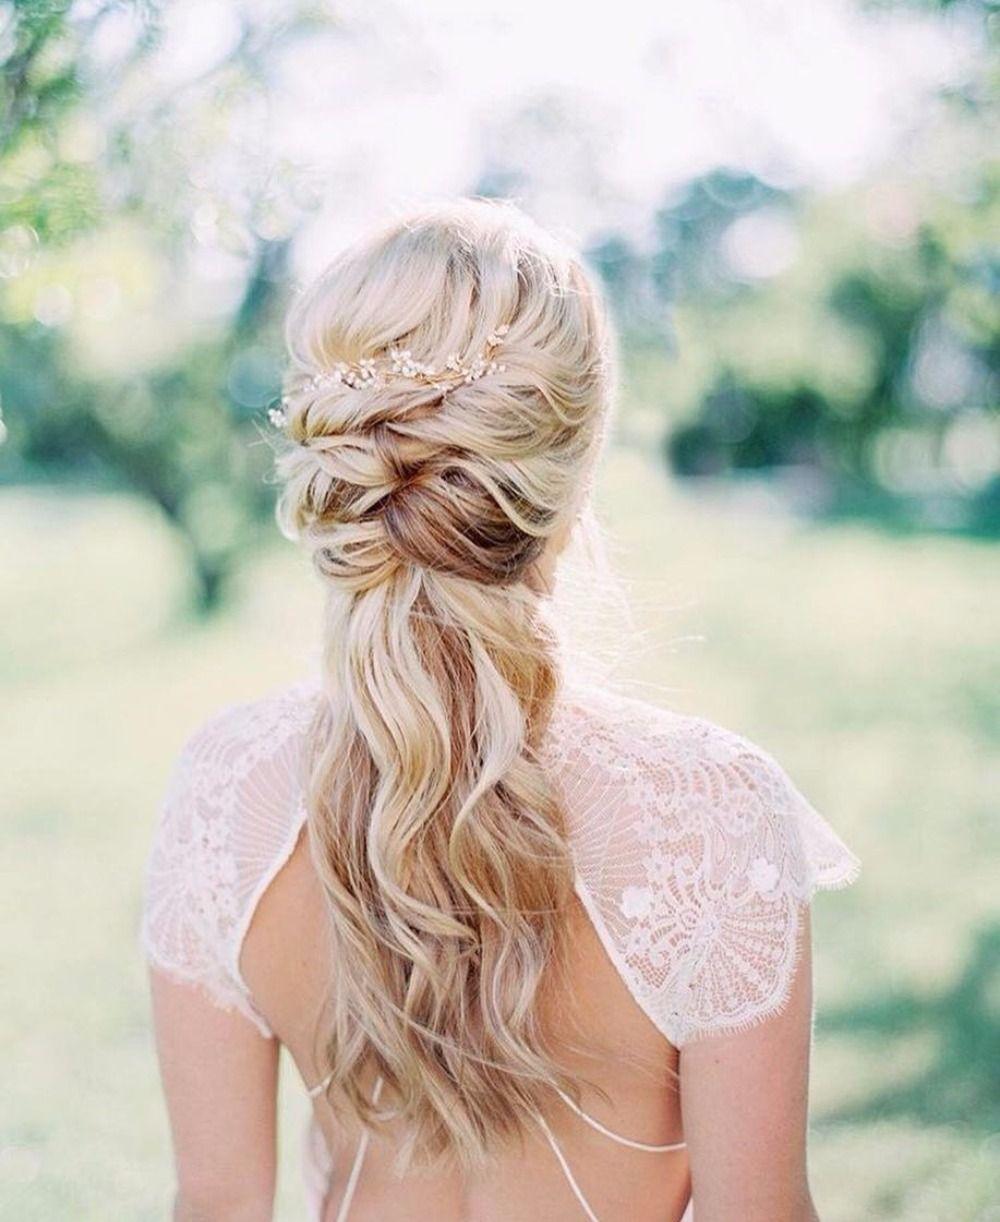 10 Lavish Wedding Hairstyles For Long Hair: 10 Secrets For Long Lasting Wedding Hair